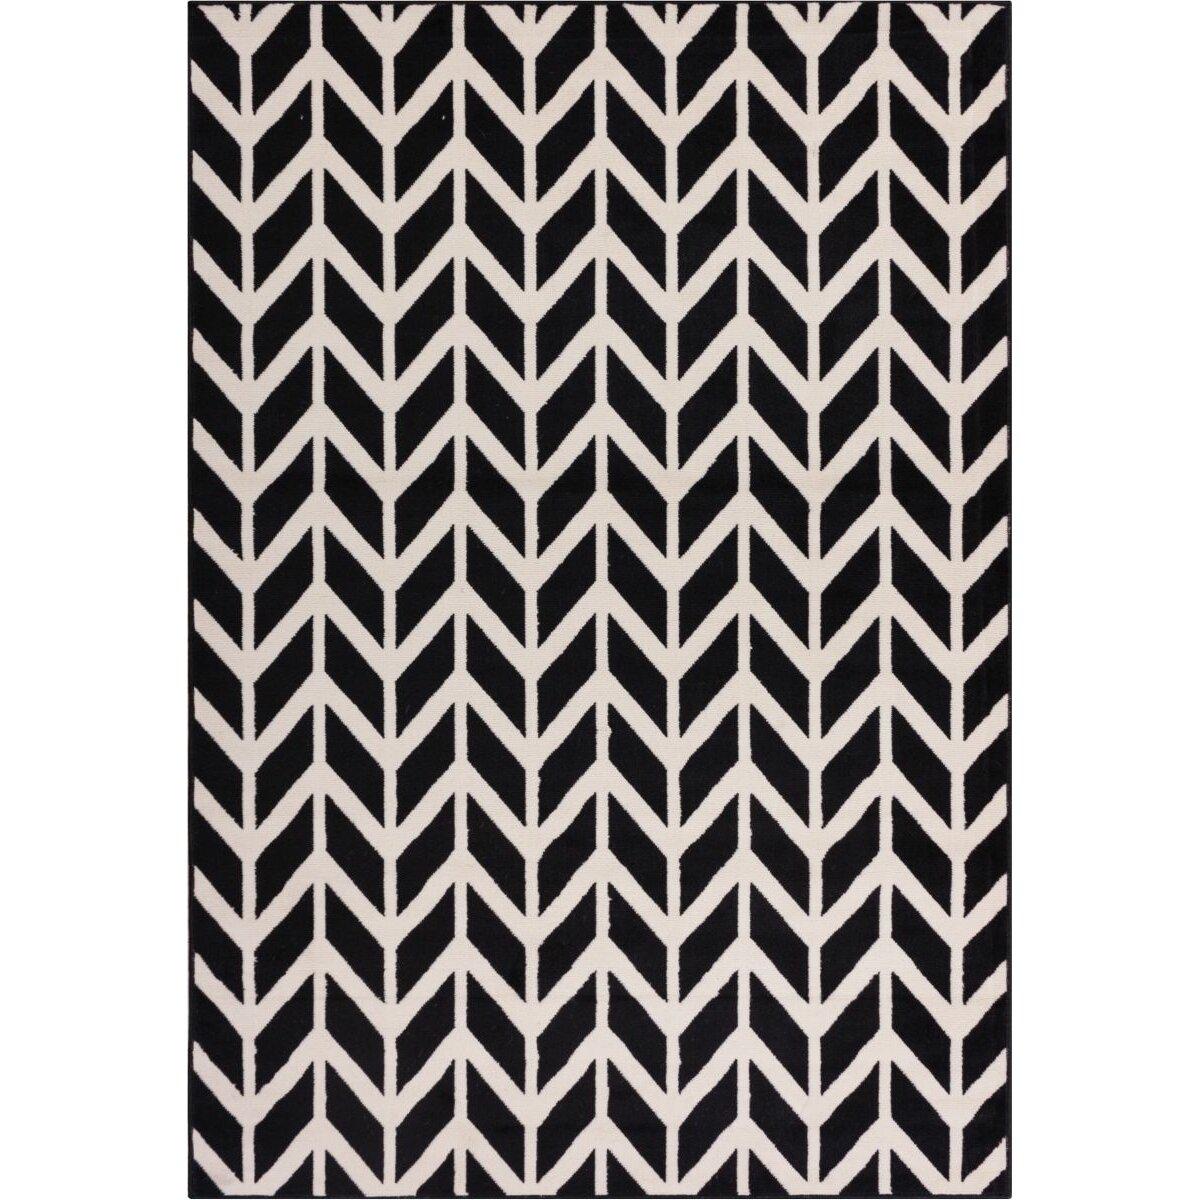 Black And White Chevron Bathroom Rug: Mercury Row Shuster Bourban Chevron Black/White Area Rug